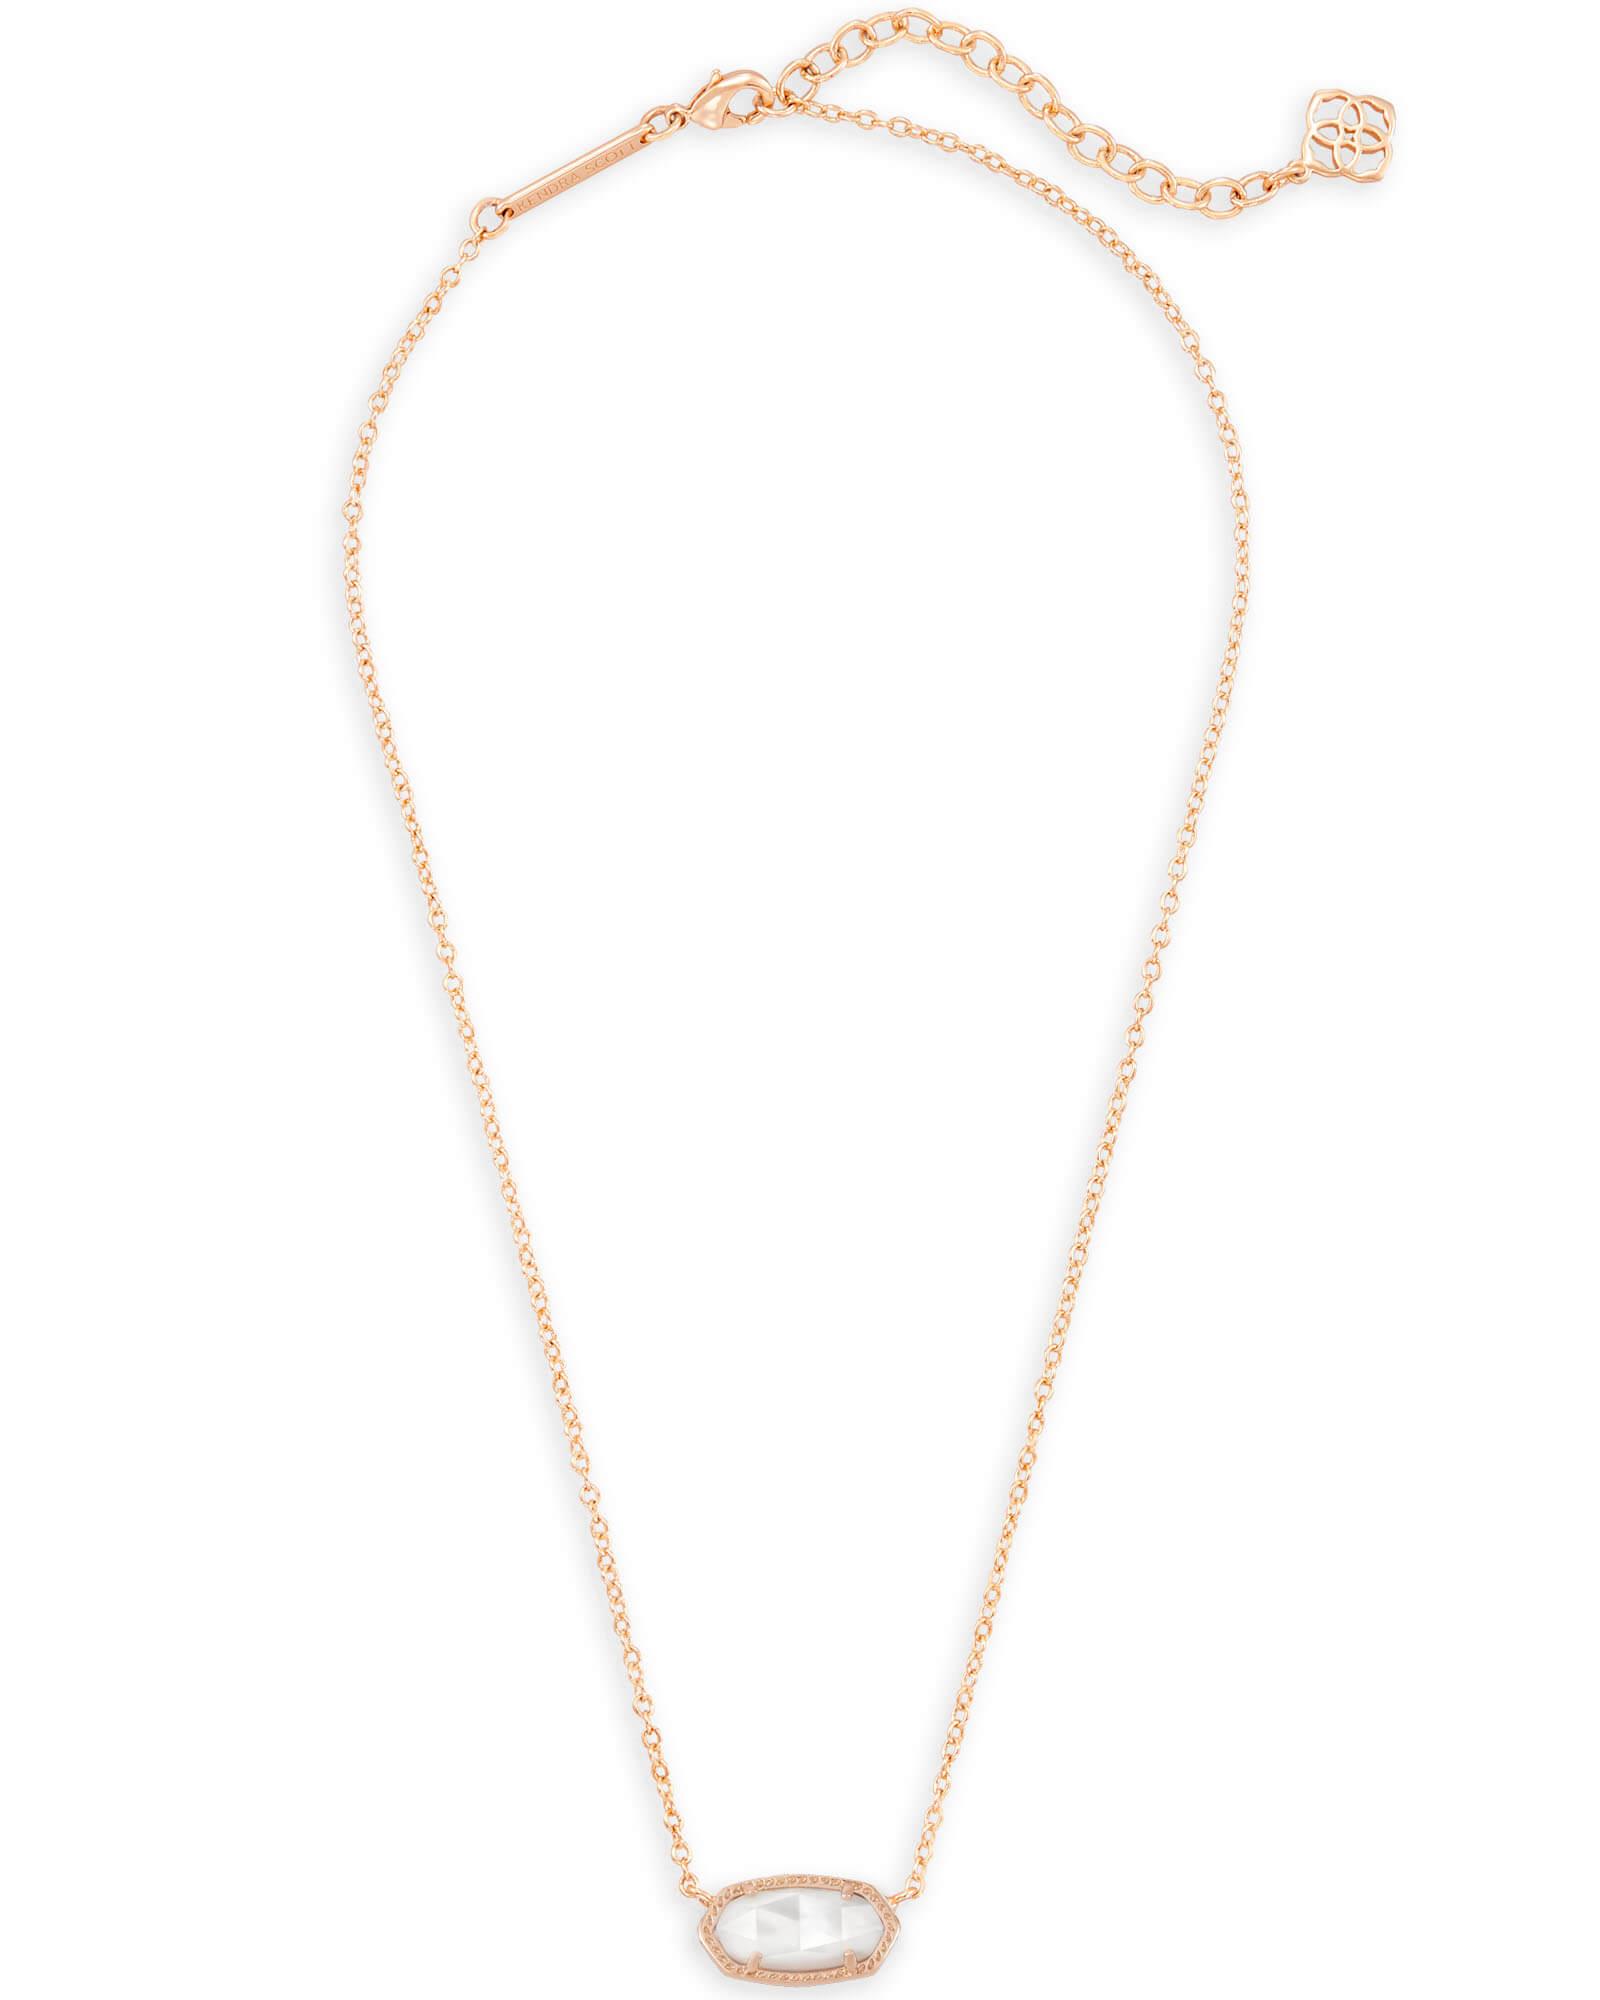 59c7159caa88b Elisa Rose Gold Pendant Necklace- Ivory Pearl | Kendra Scott